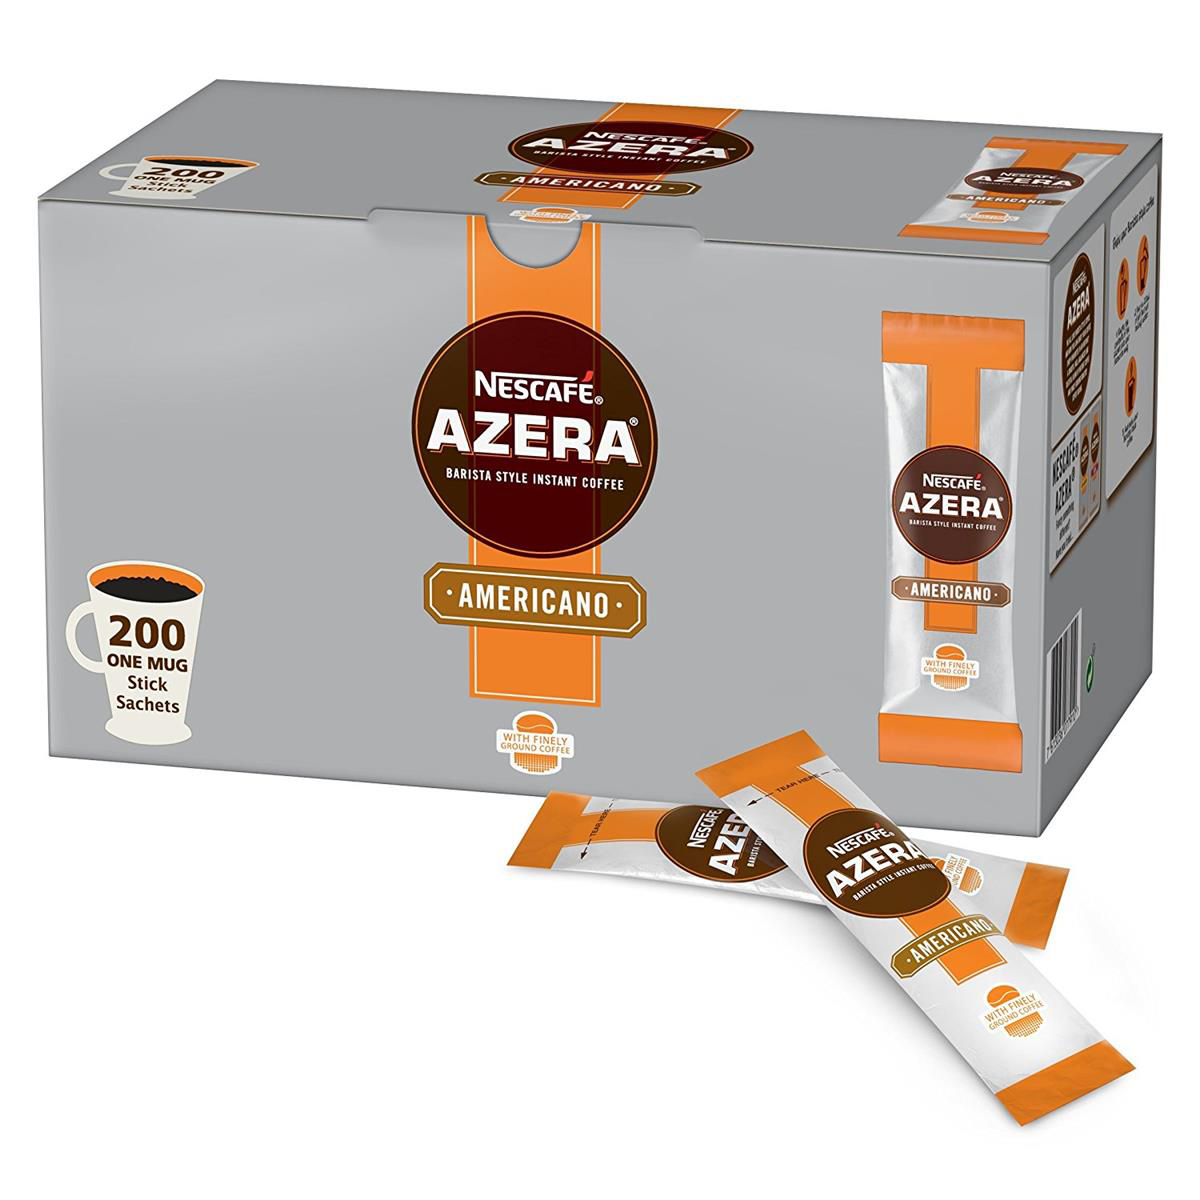 Coffee Nescafe Azera Americano Instant Coffee Sachets 2g Ref 12356930 Pack 200